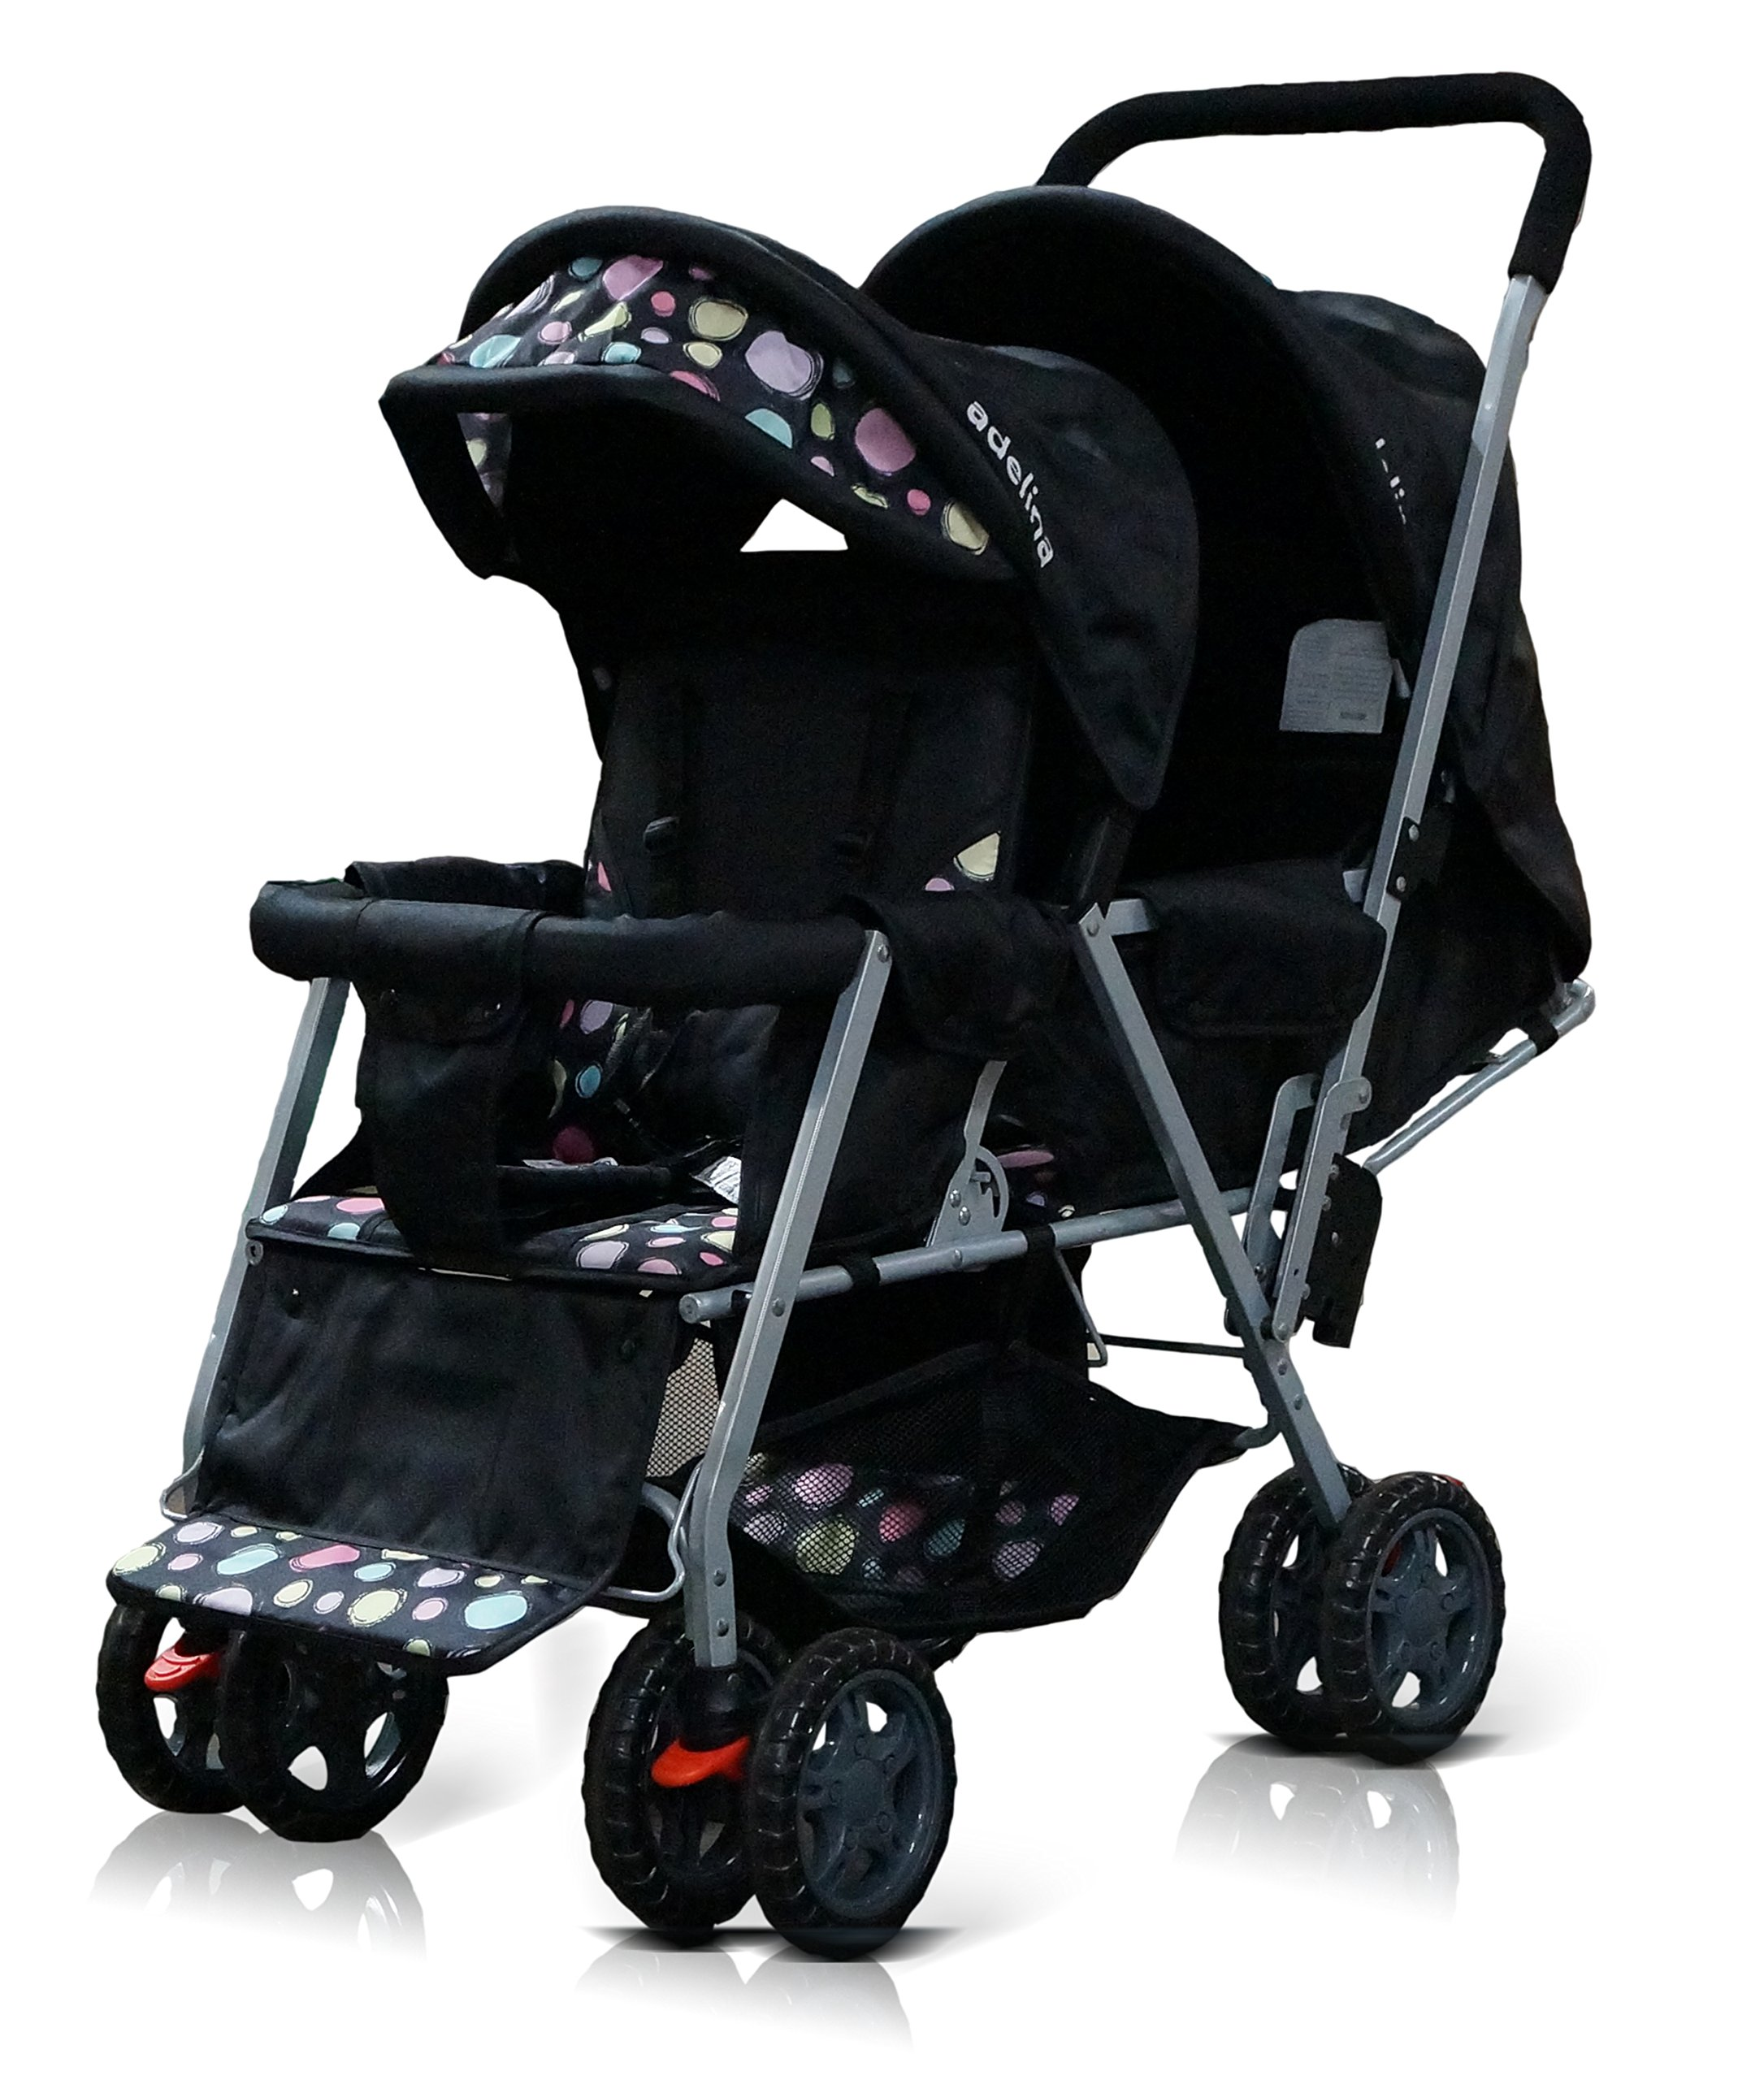 ADELINA Designer Double Stroller, Black